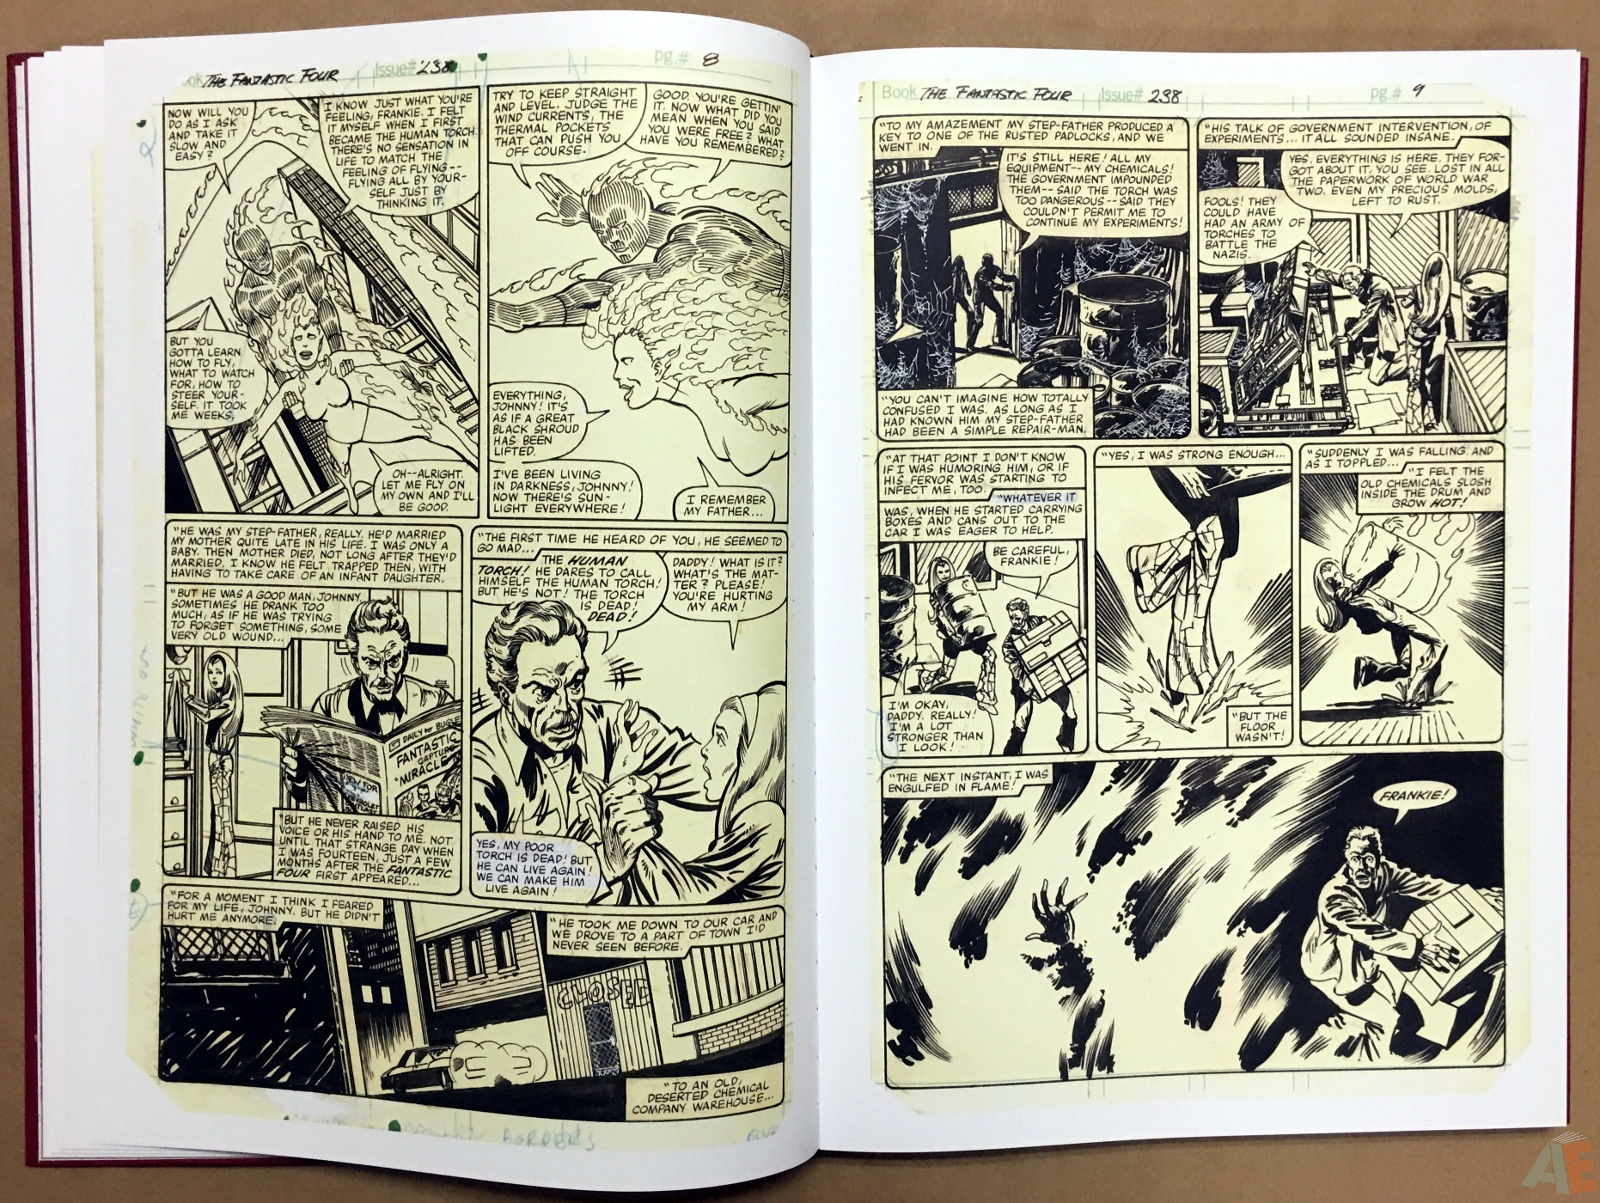 John Byrne's The Fantastic Four Artist's Edition 16